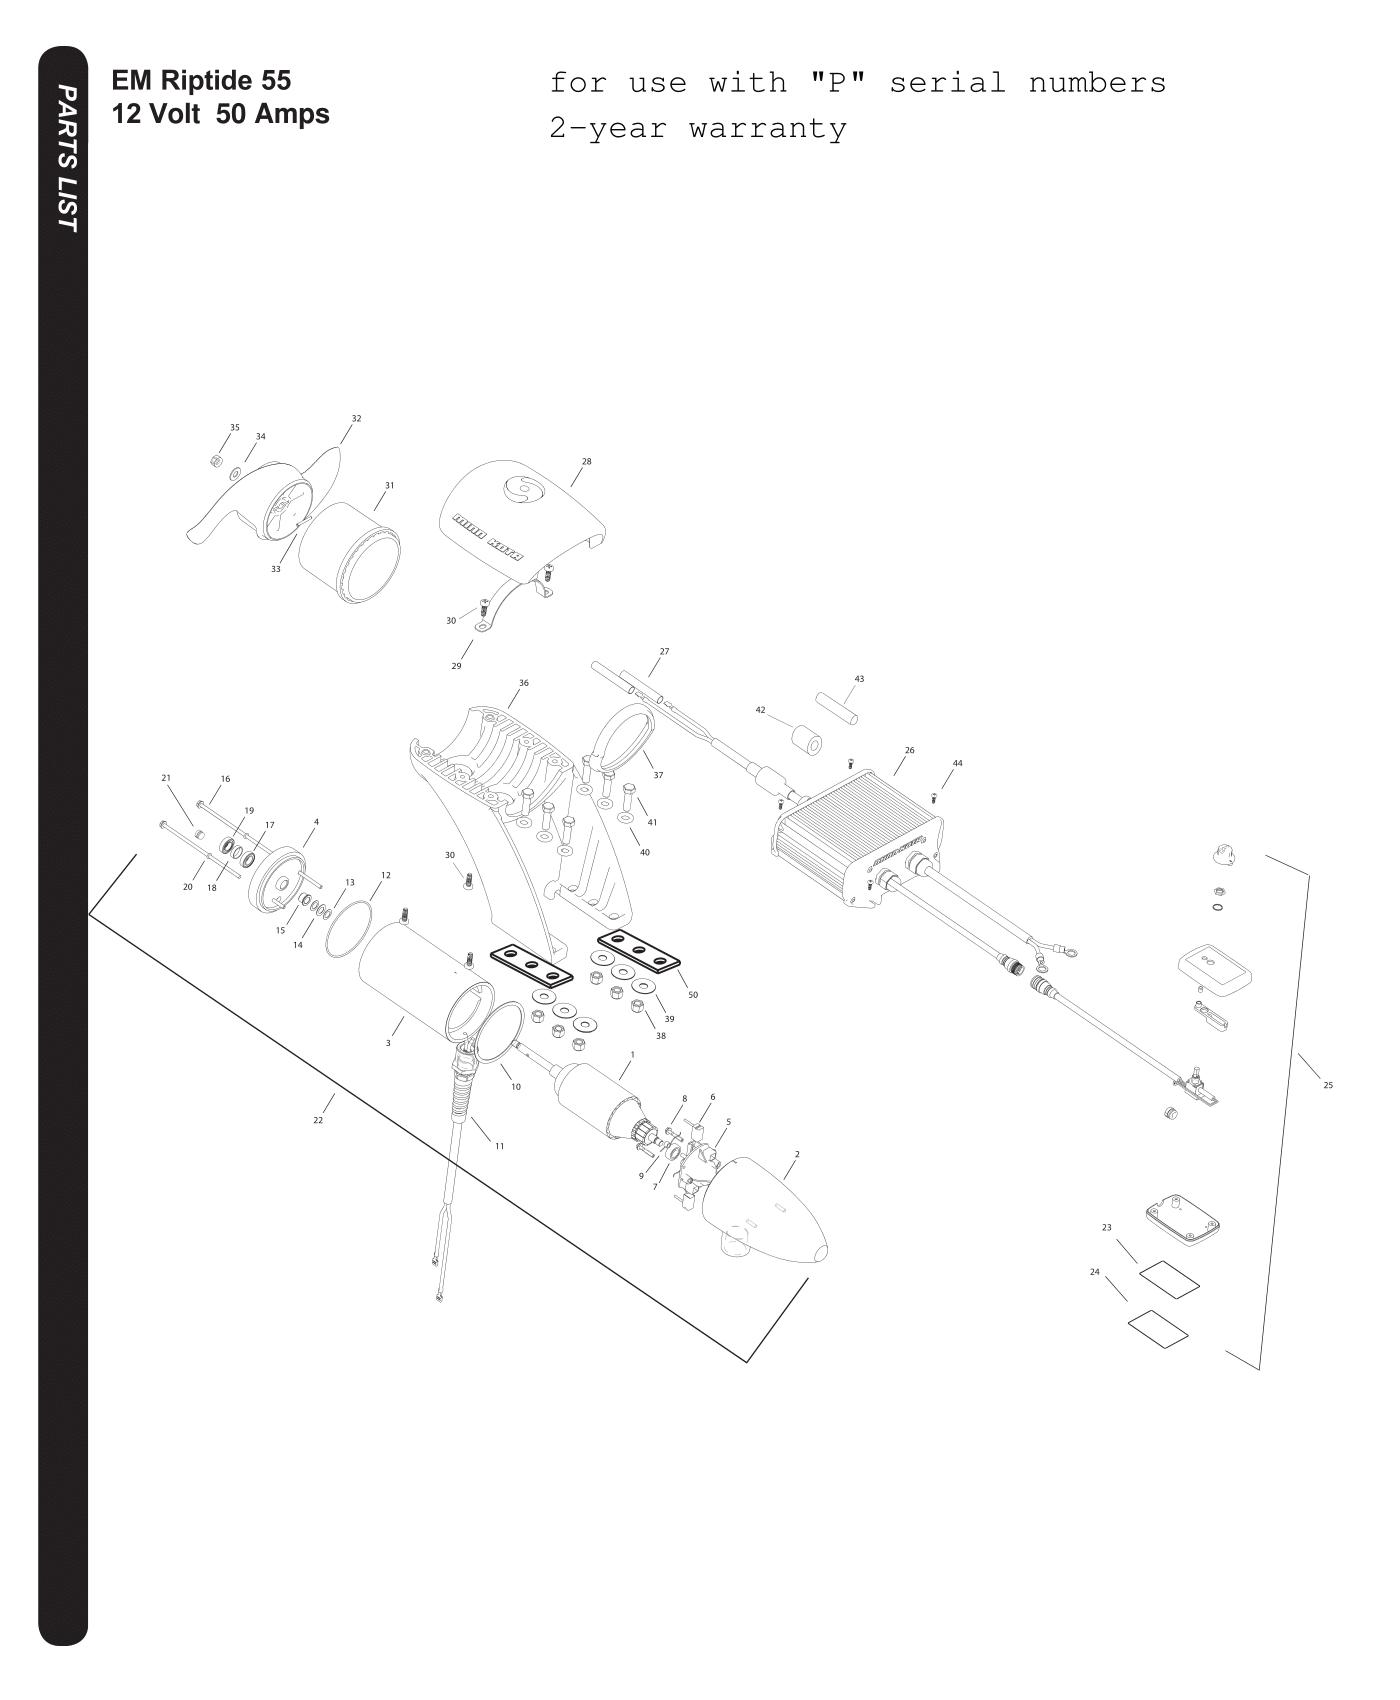 2015-mk-riptideem55-1.png